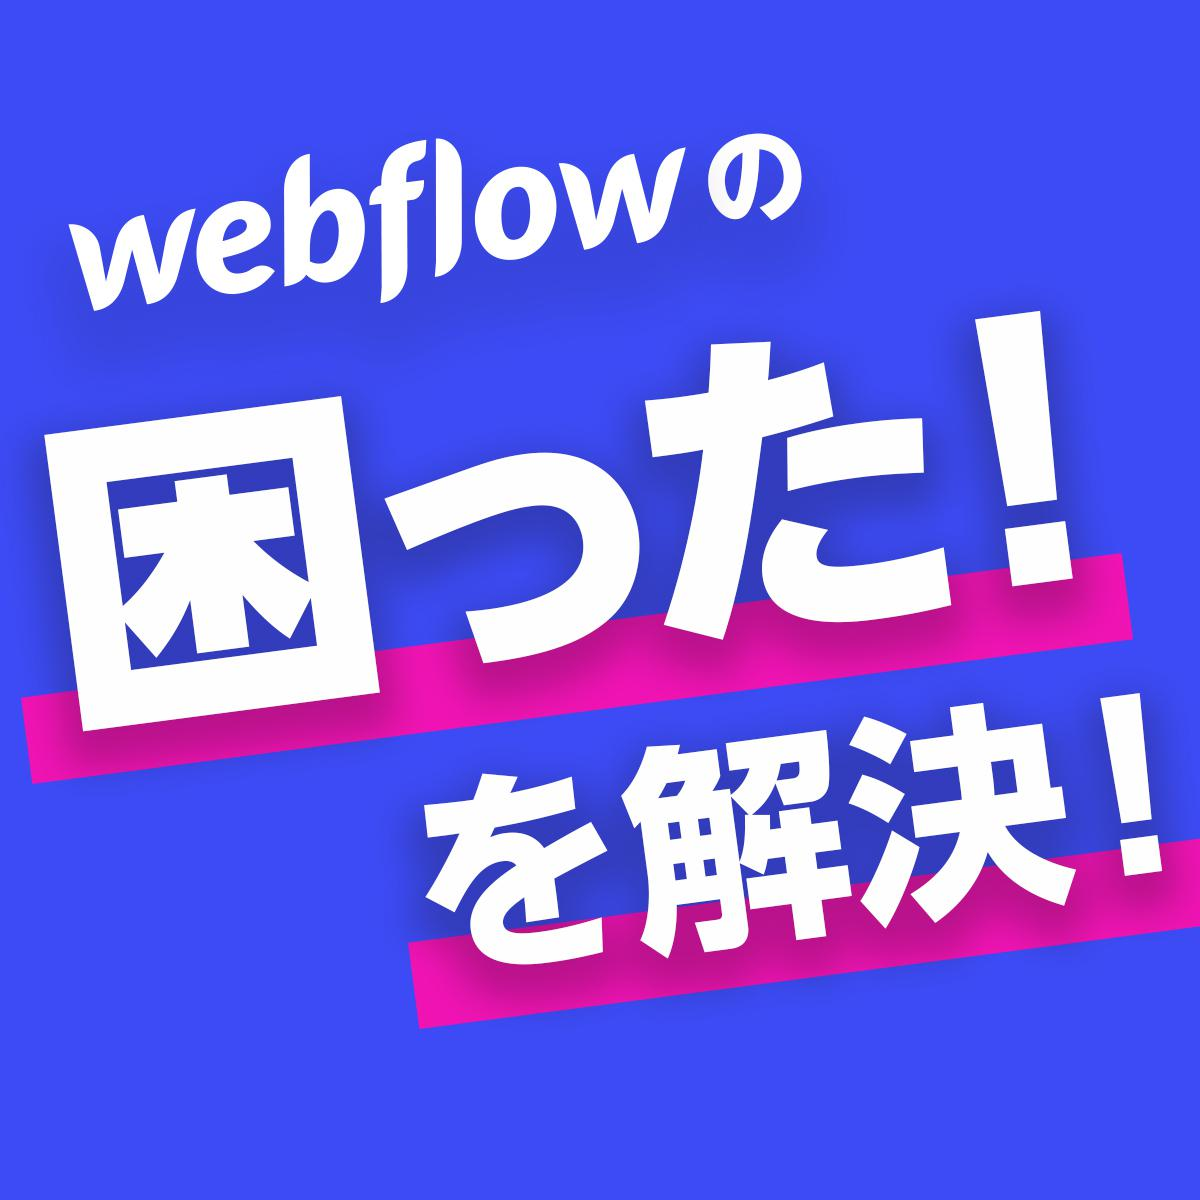 Webflowでお困りの方!ご質問にお答えします レイアウトがうまくいかない!など、お気軽にどうぞ! イメージ1